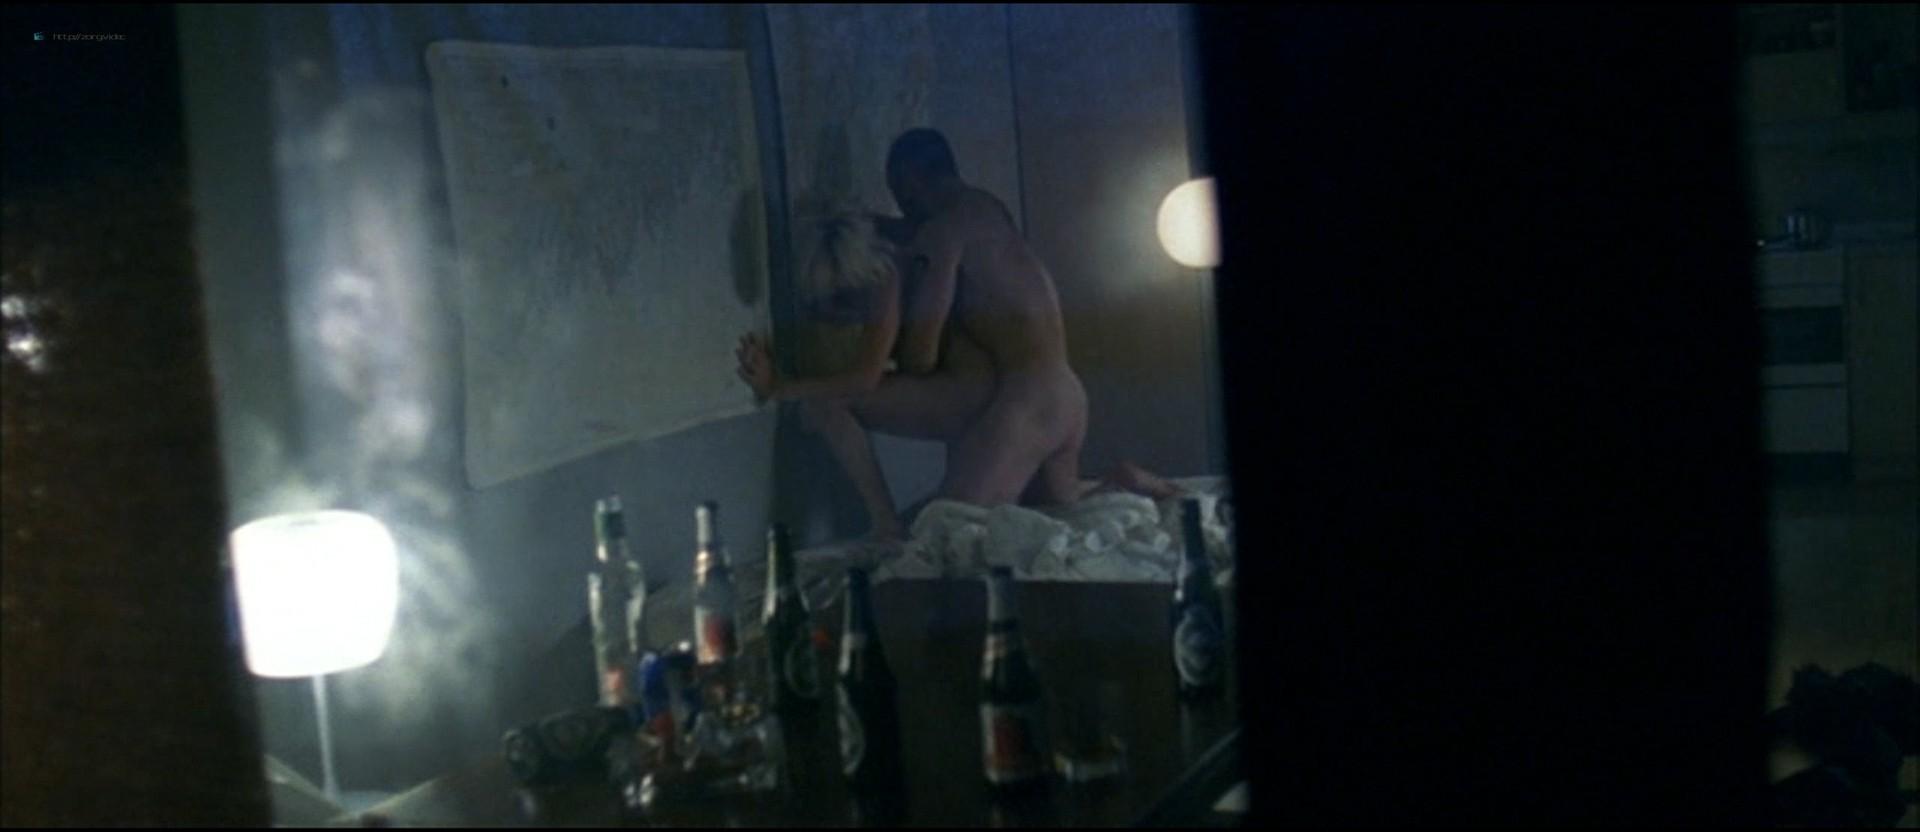 Signe Egholm Olsen nude hot sex Pernille Vallentin nude sex too - Nordkraft (DK-2005) HD 1080p Web (5)